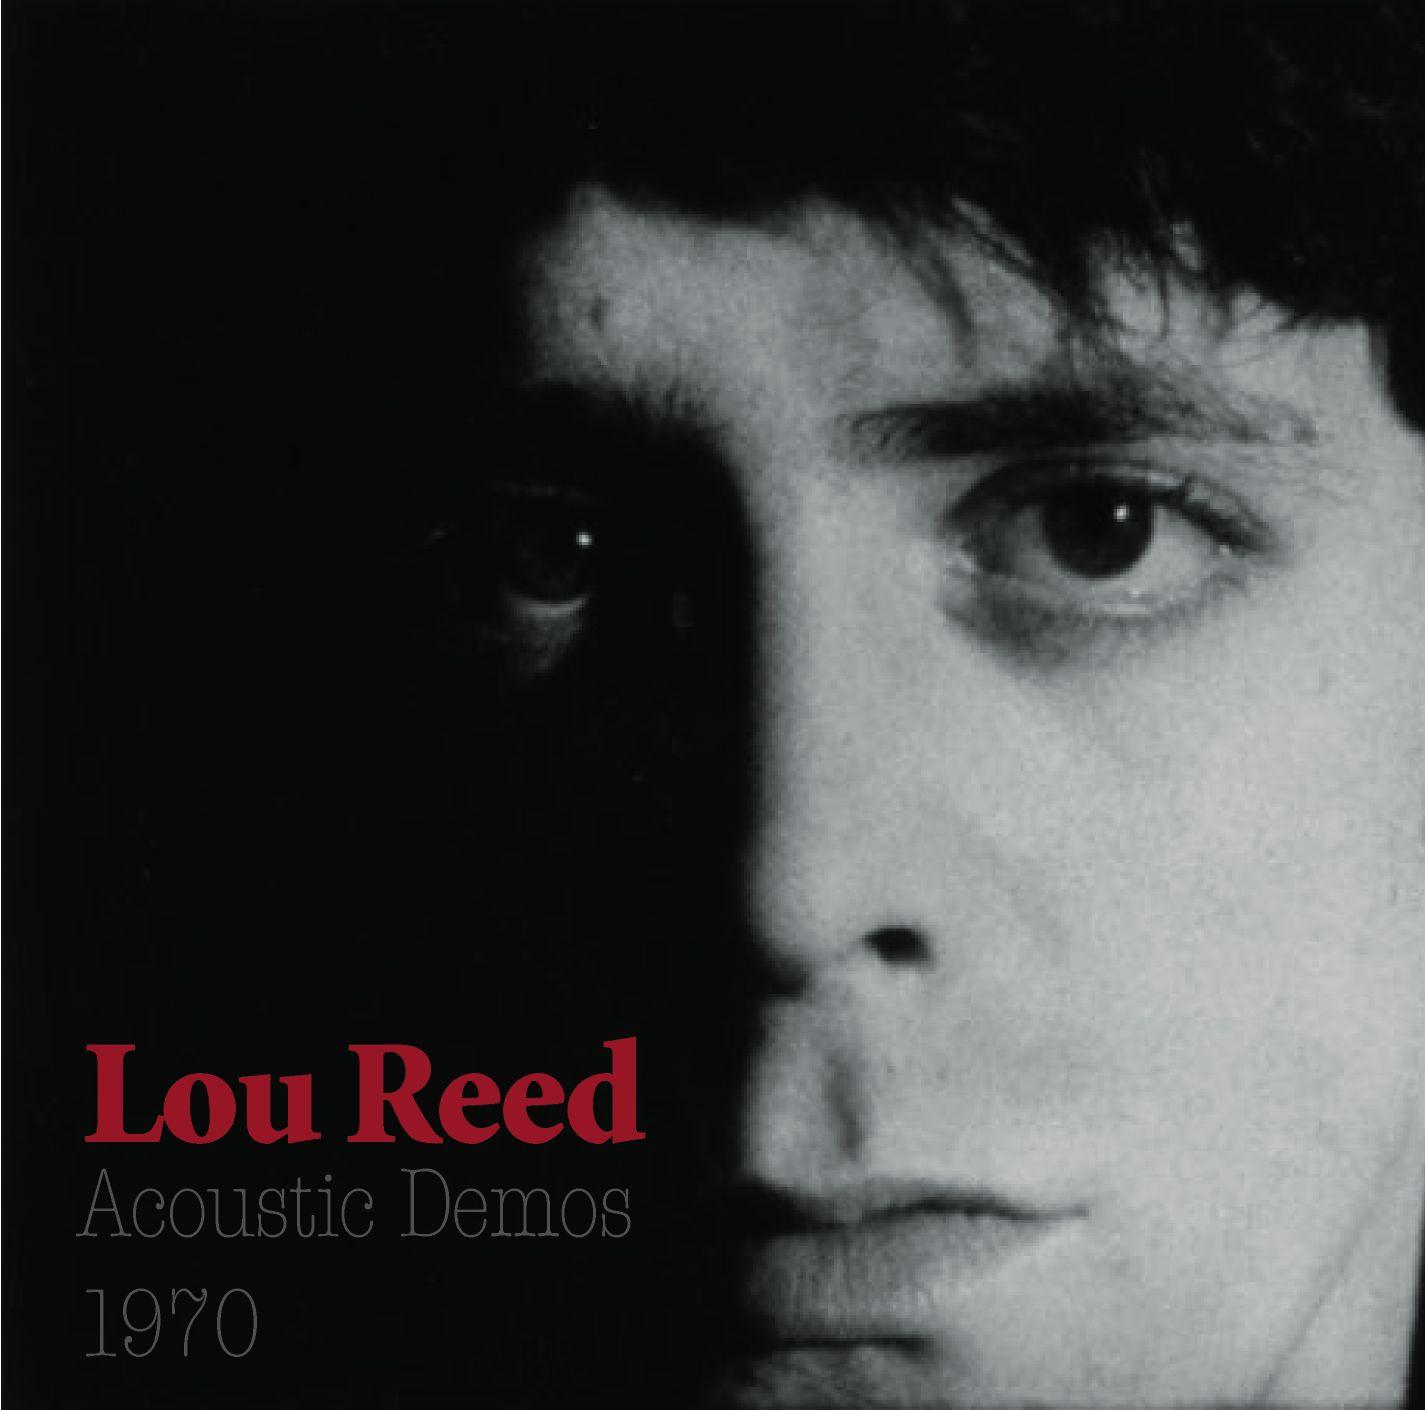 T U B E : Lou Reed - 1970 - Acoustic Demos (STU/FLAC)